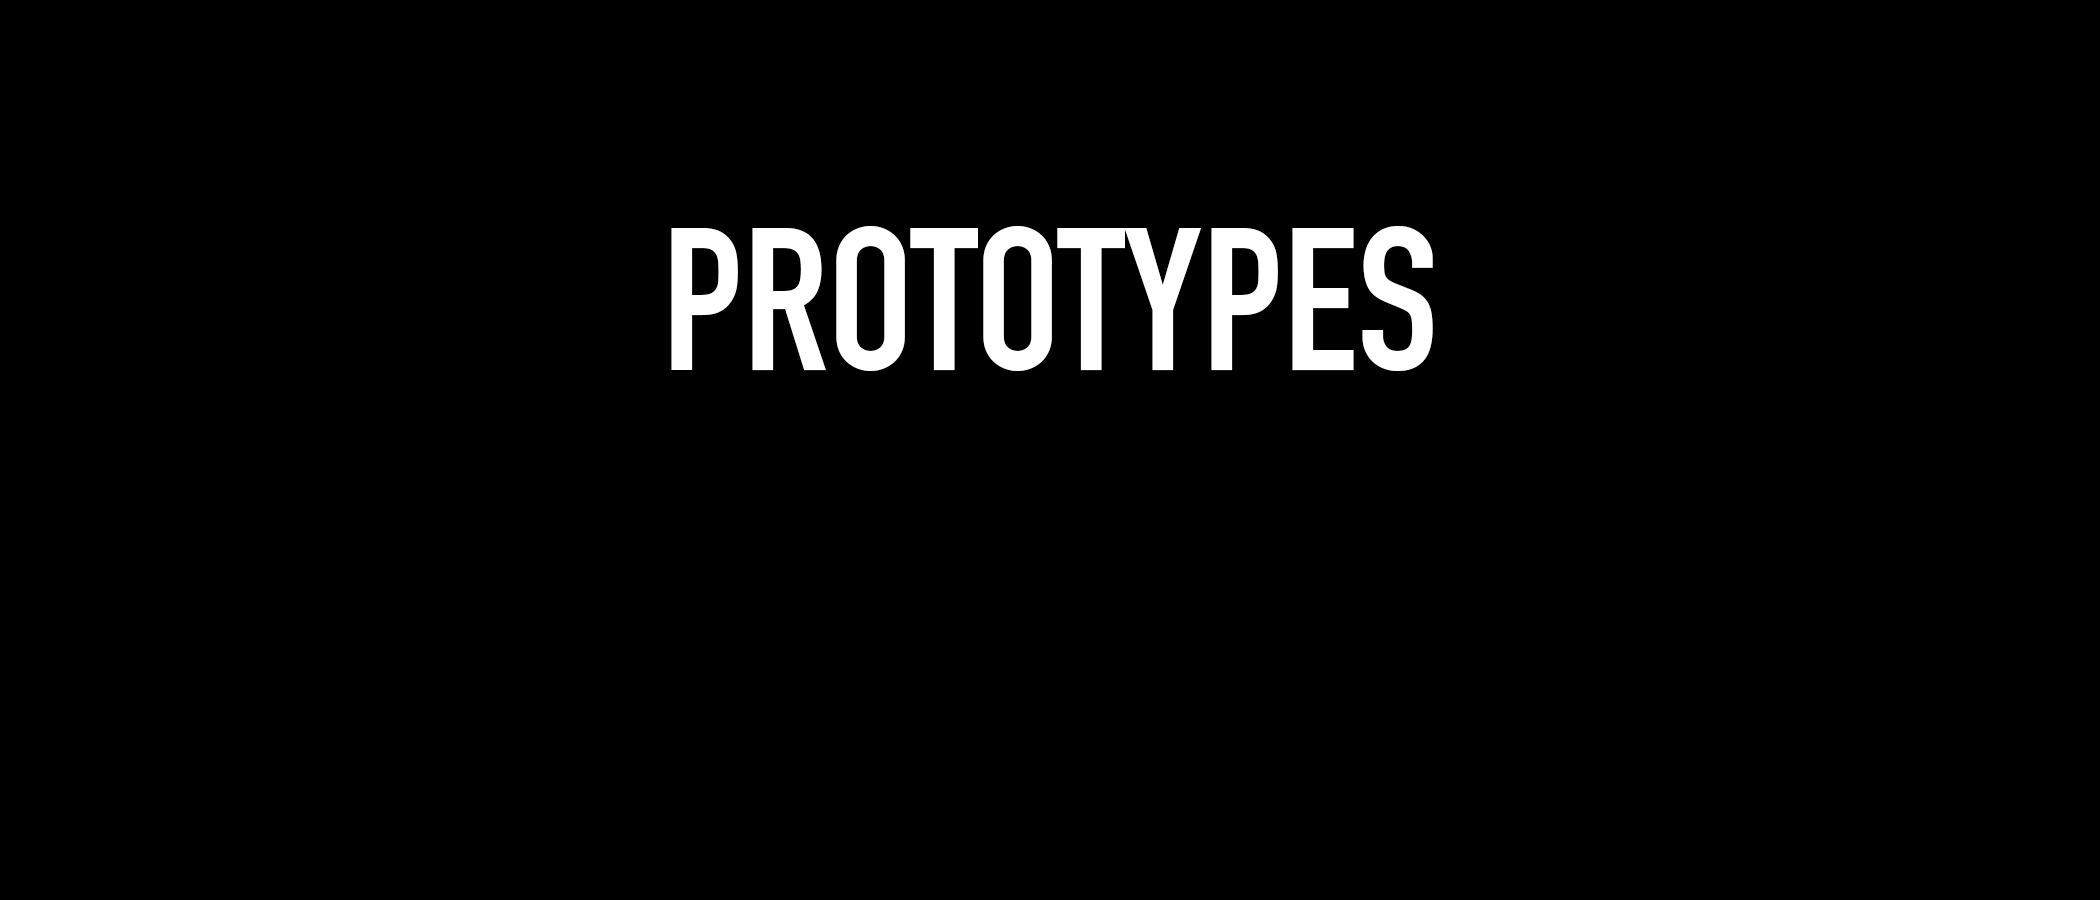 prototypes button.jpg